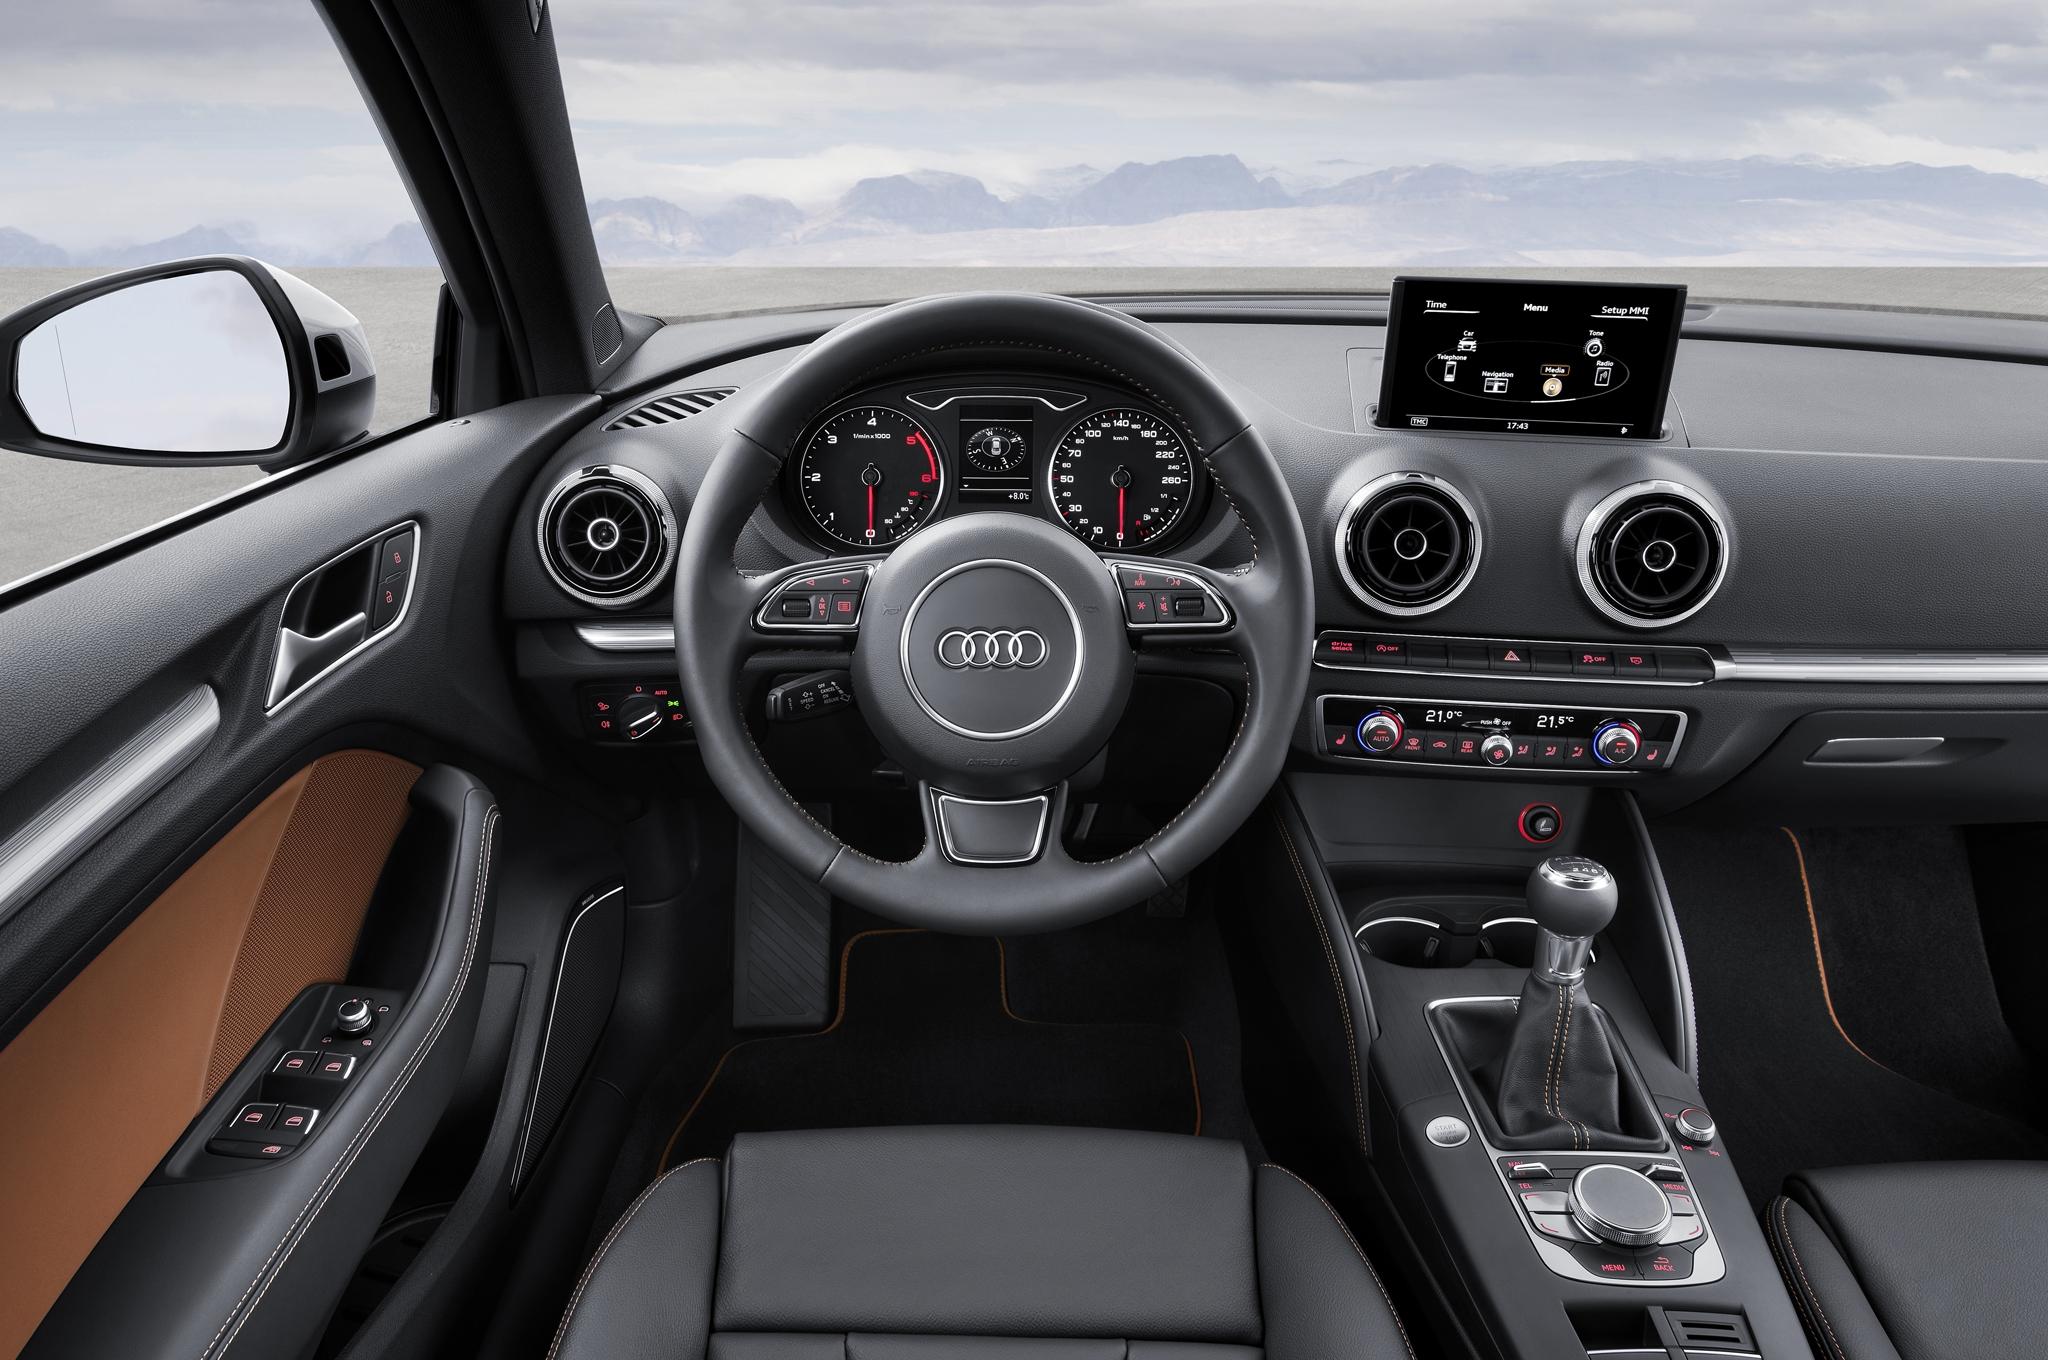 2015 Audi S3 Sedan Cockpit and Dashboard Interior